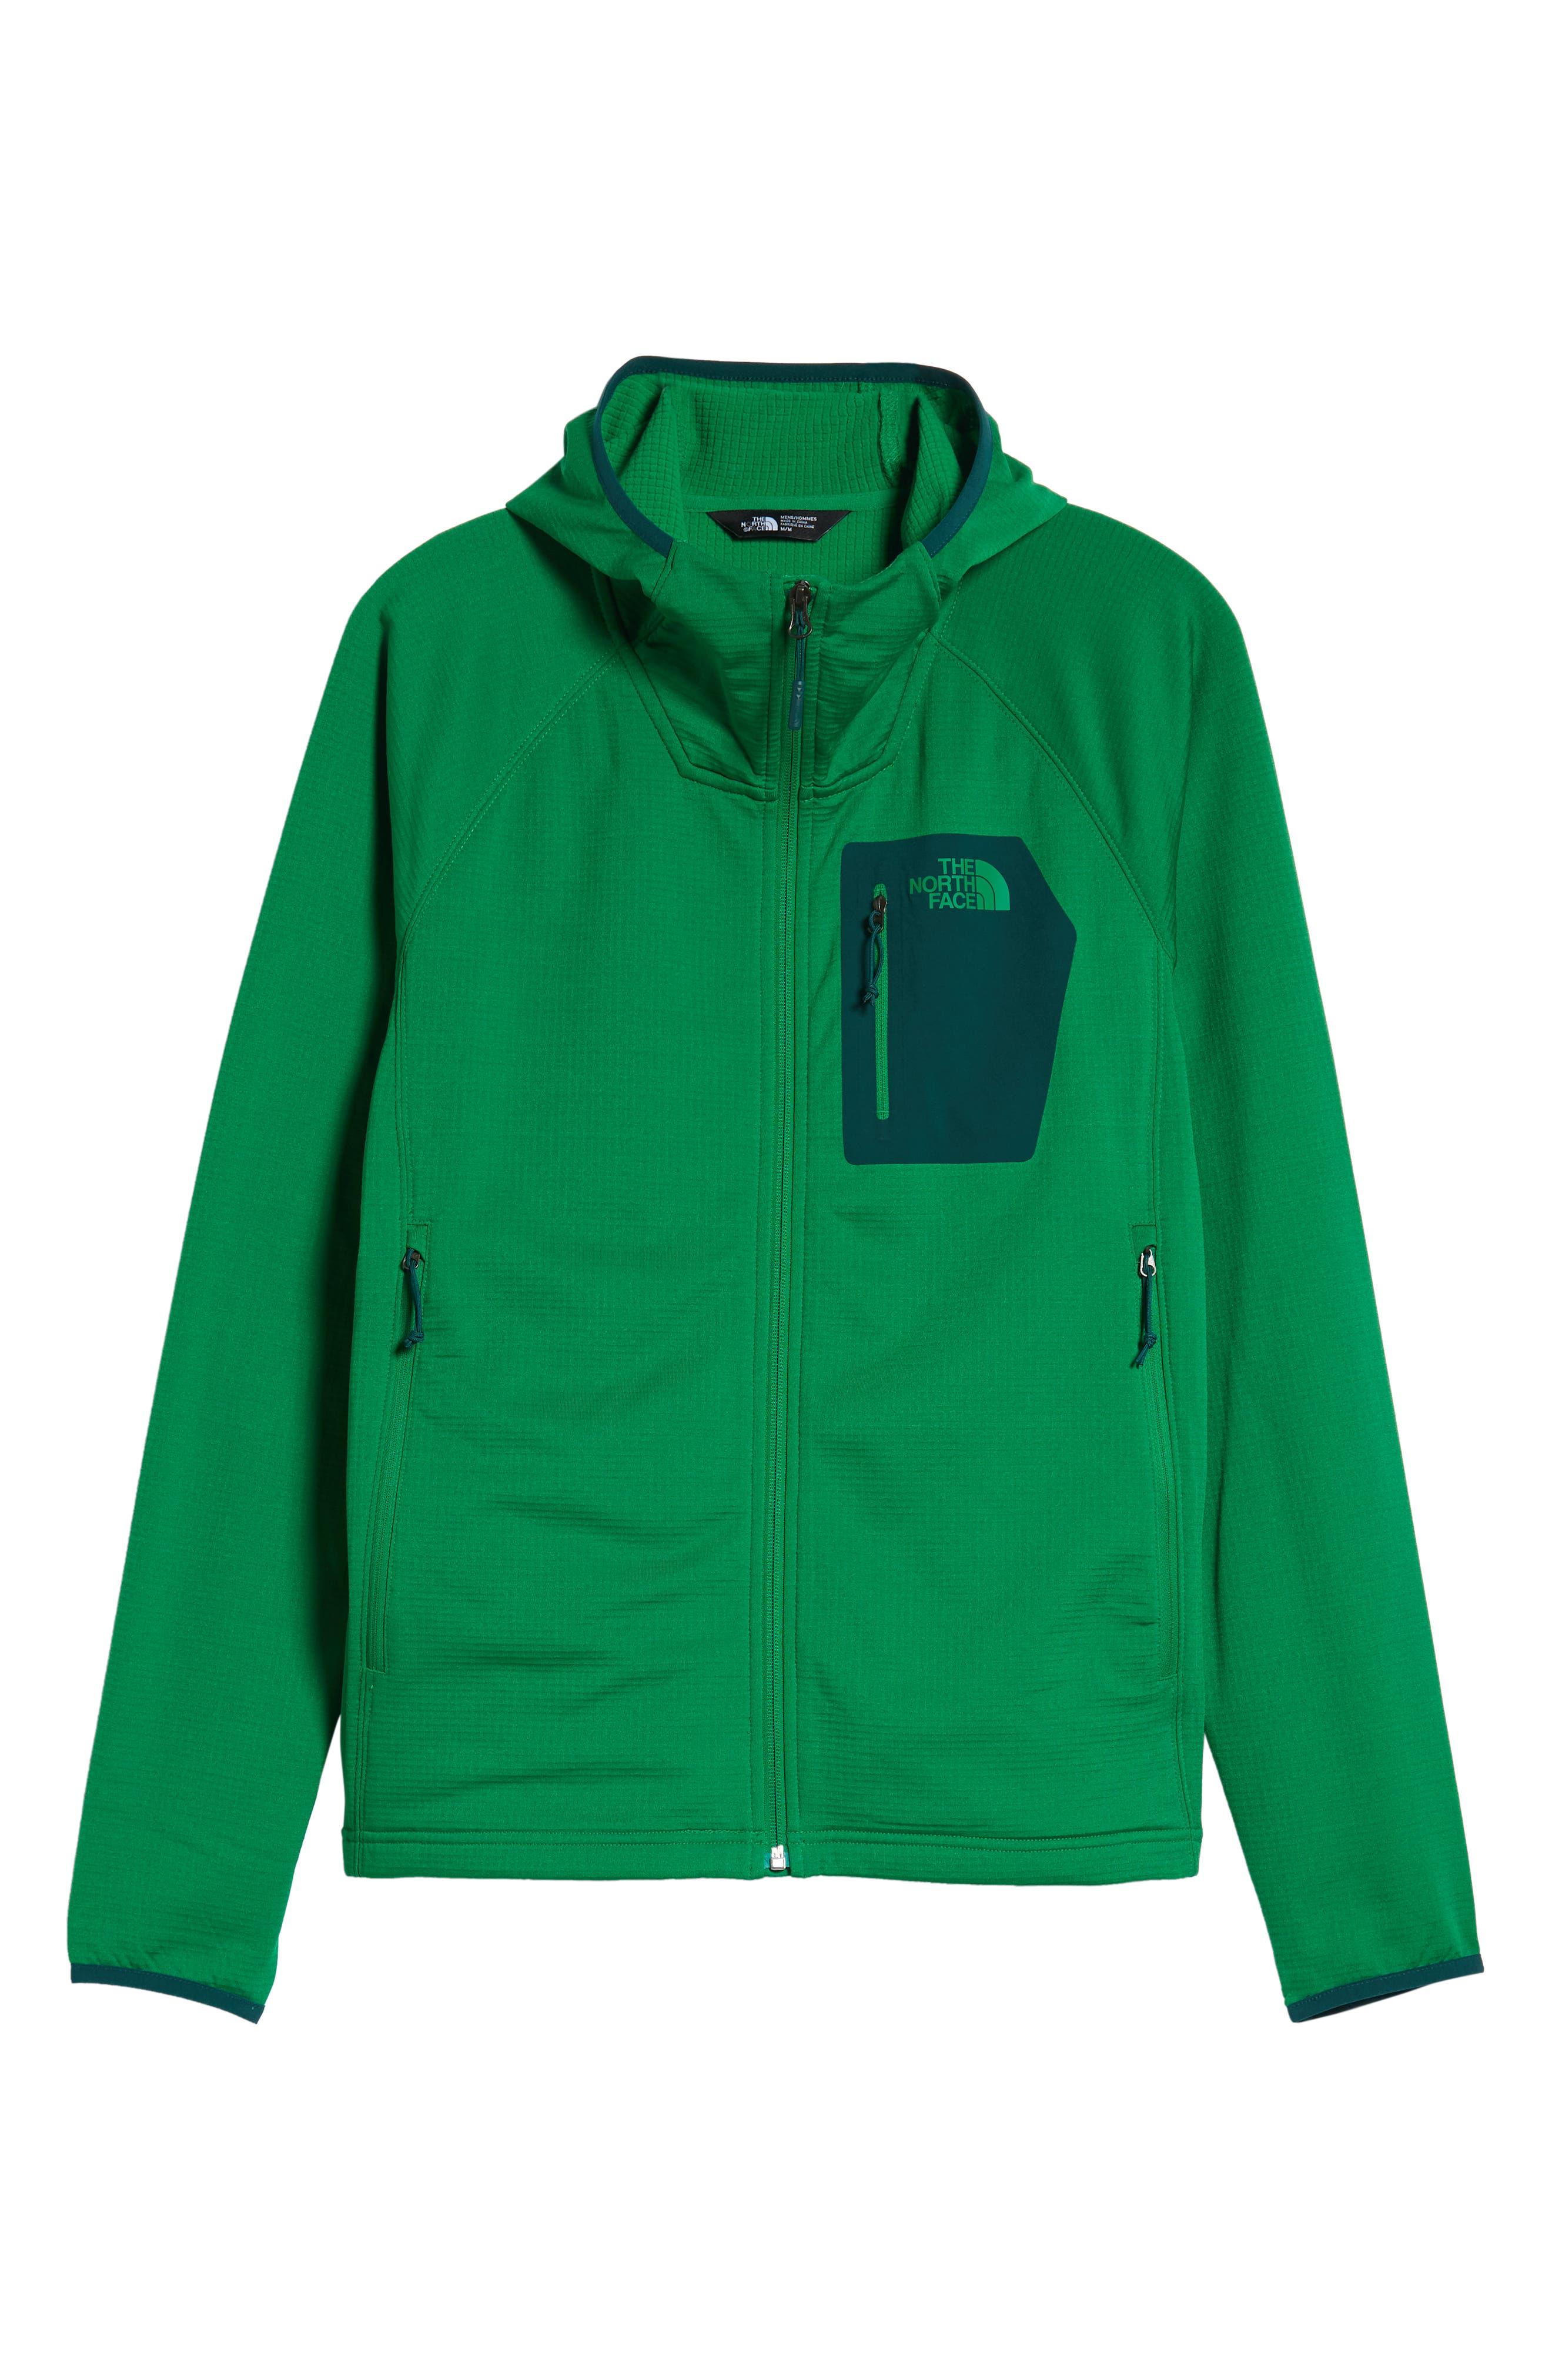 Borod Zip Fleece Jacket,                             Alternate thumbnail 6, color,                             PRIMARY GREEN/GARDEN GREEN